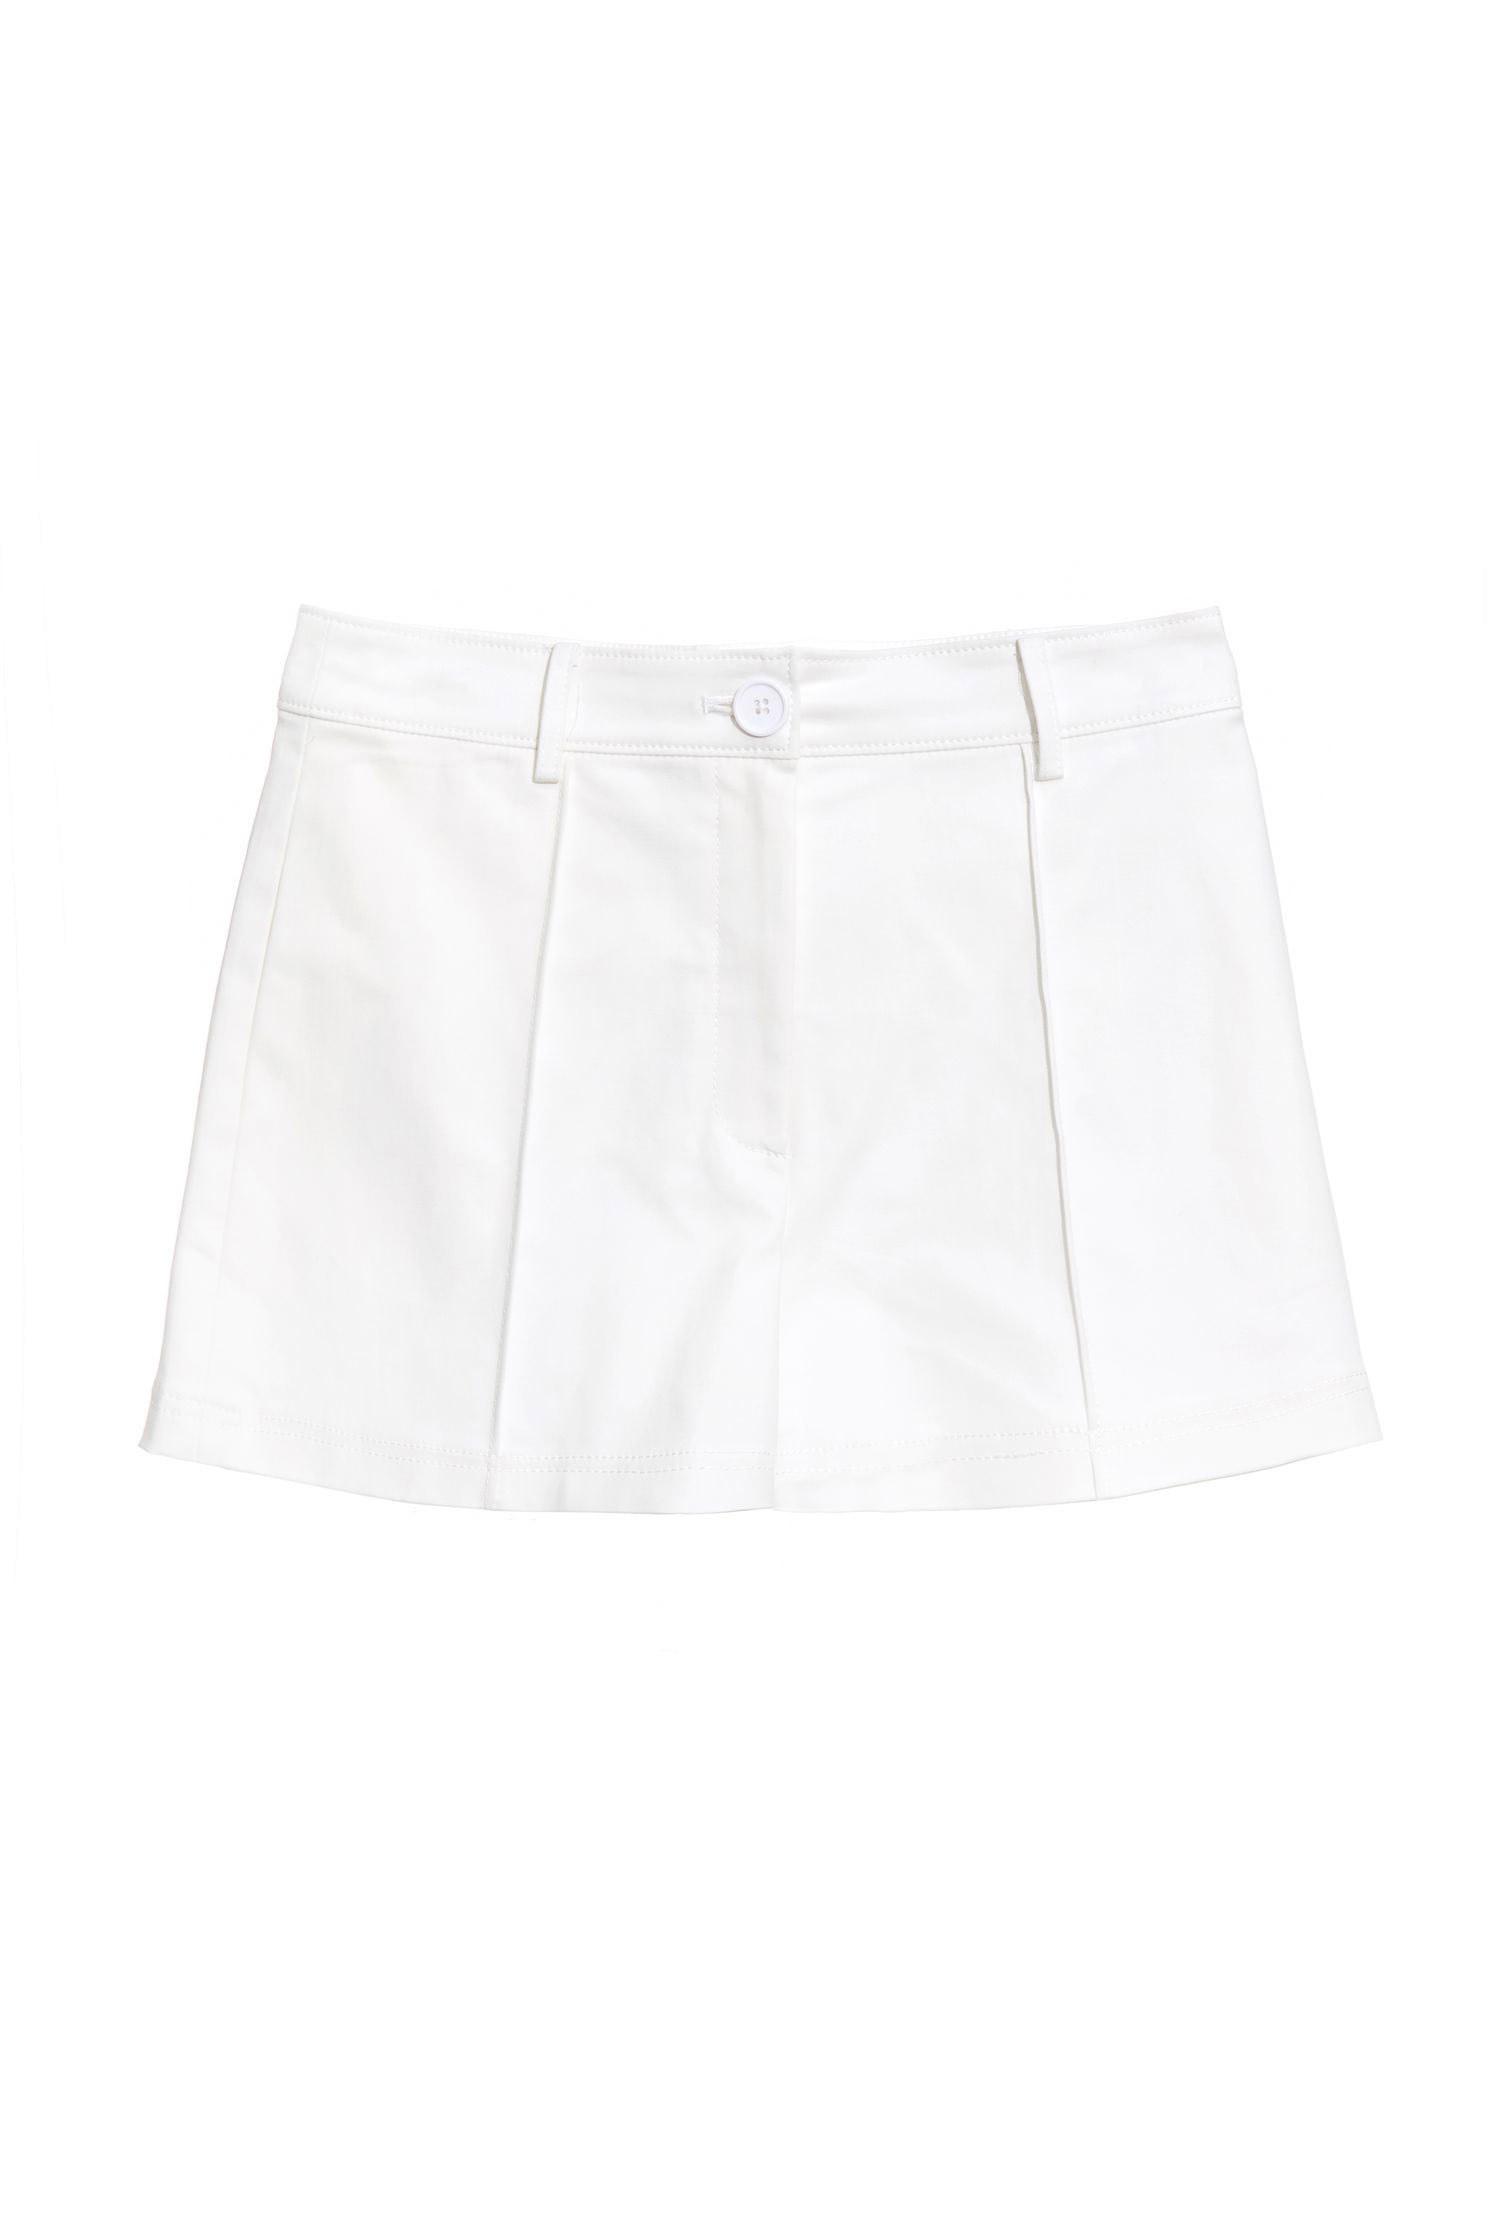 Thin! Pleated white shorts